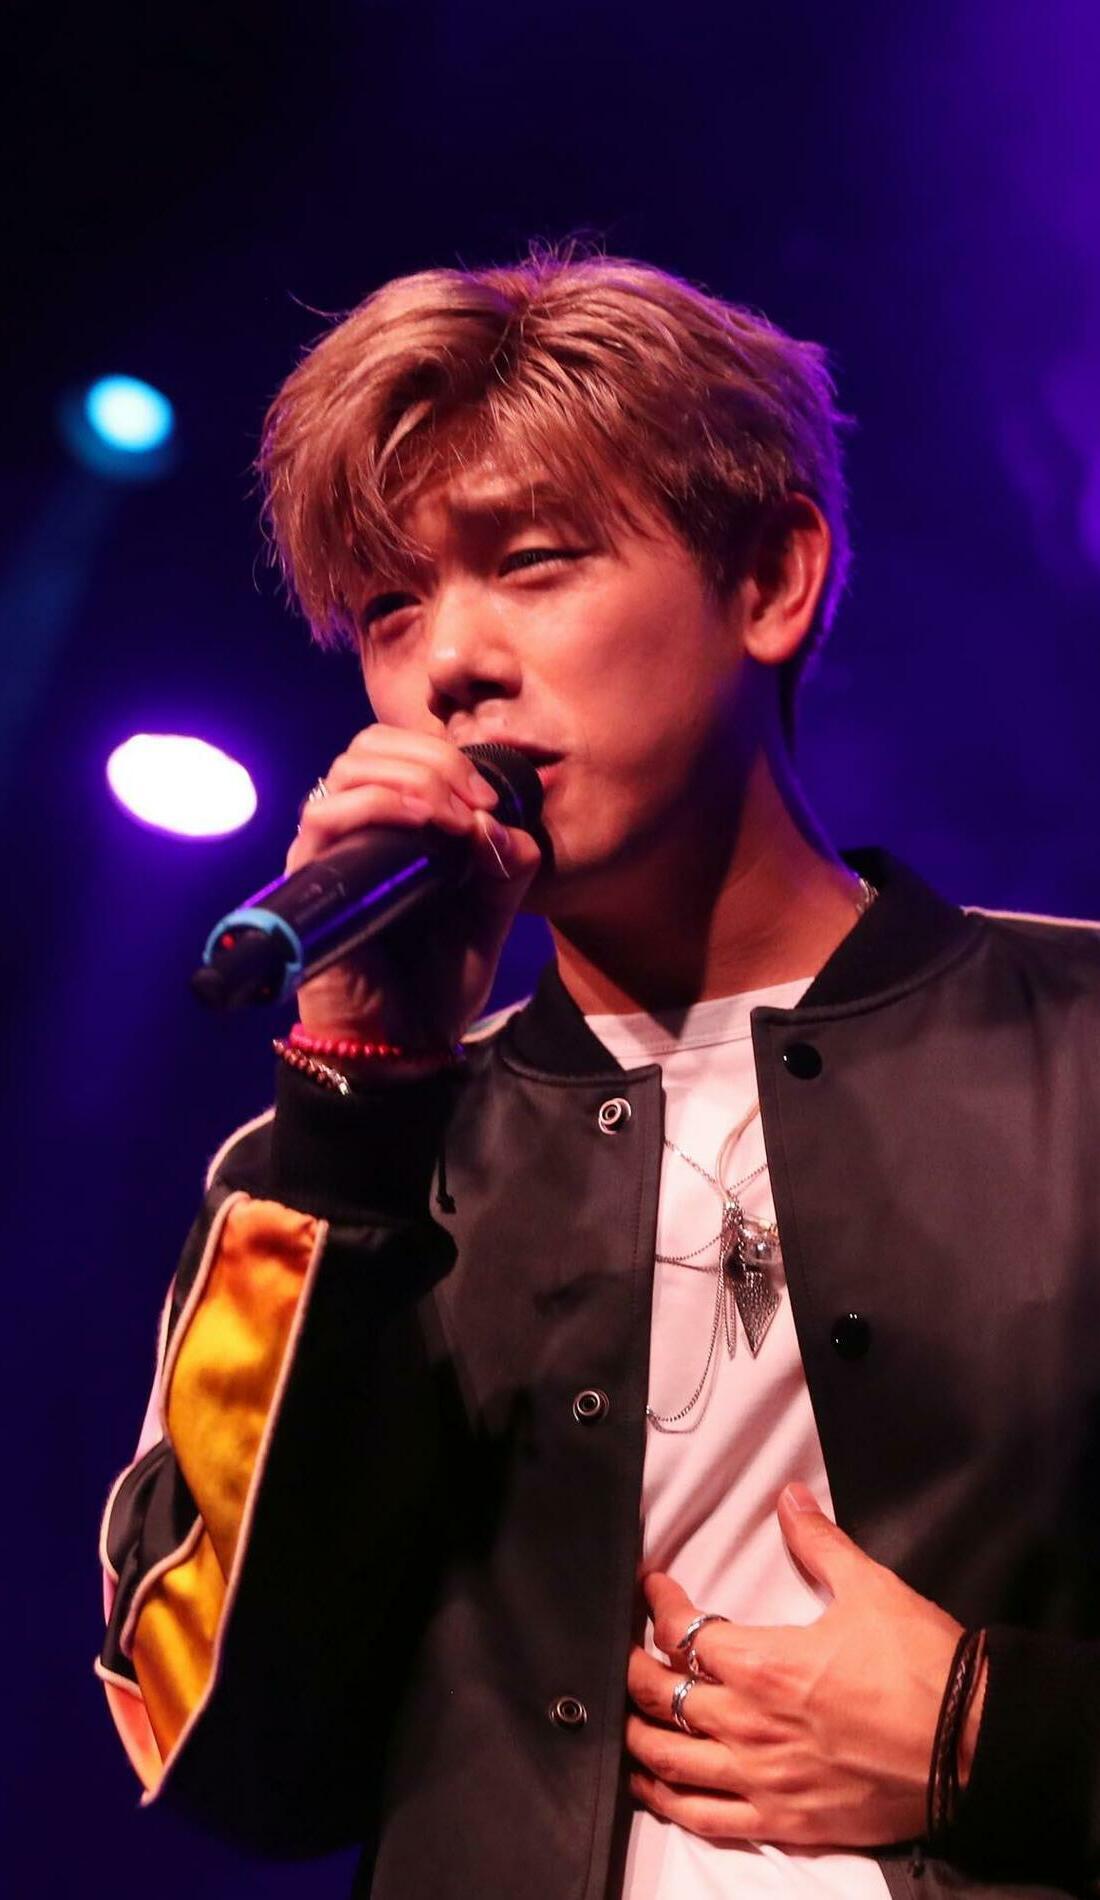 A Eric Nam live event